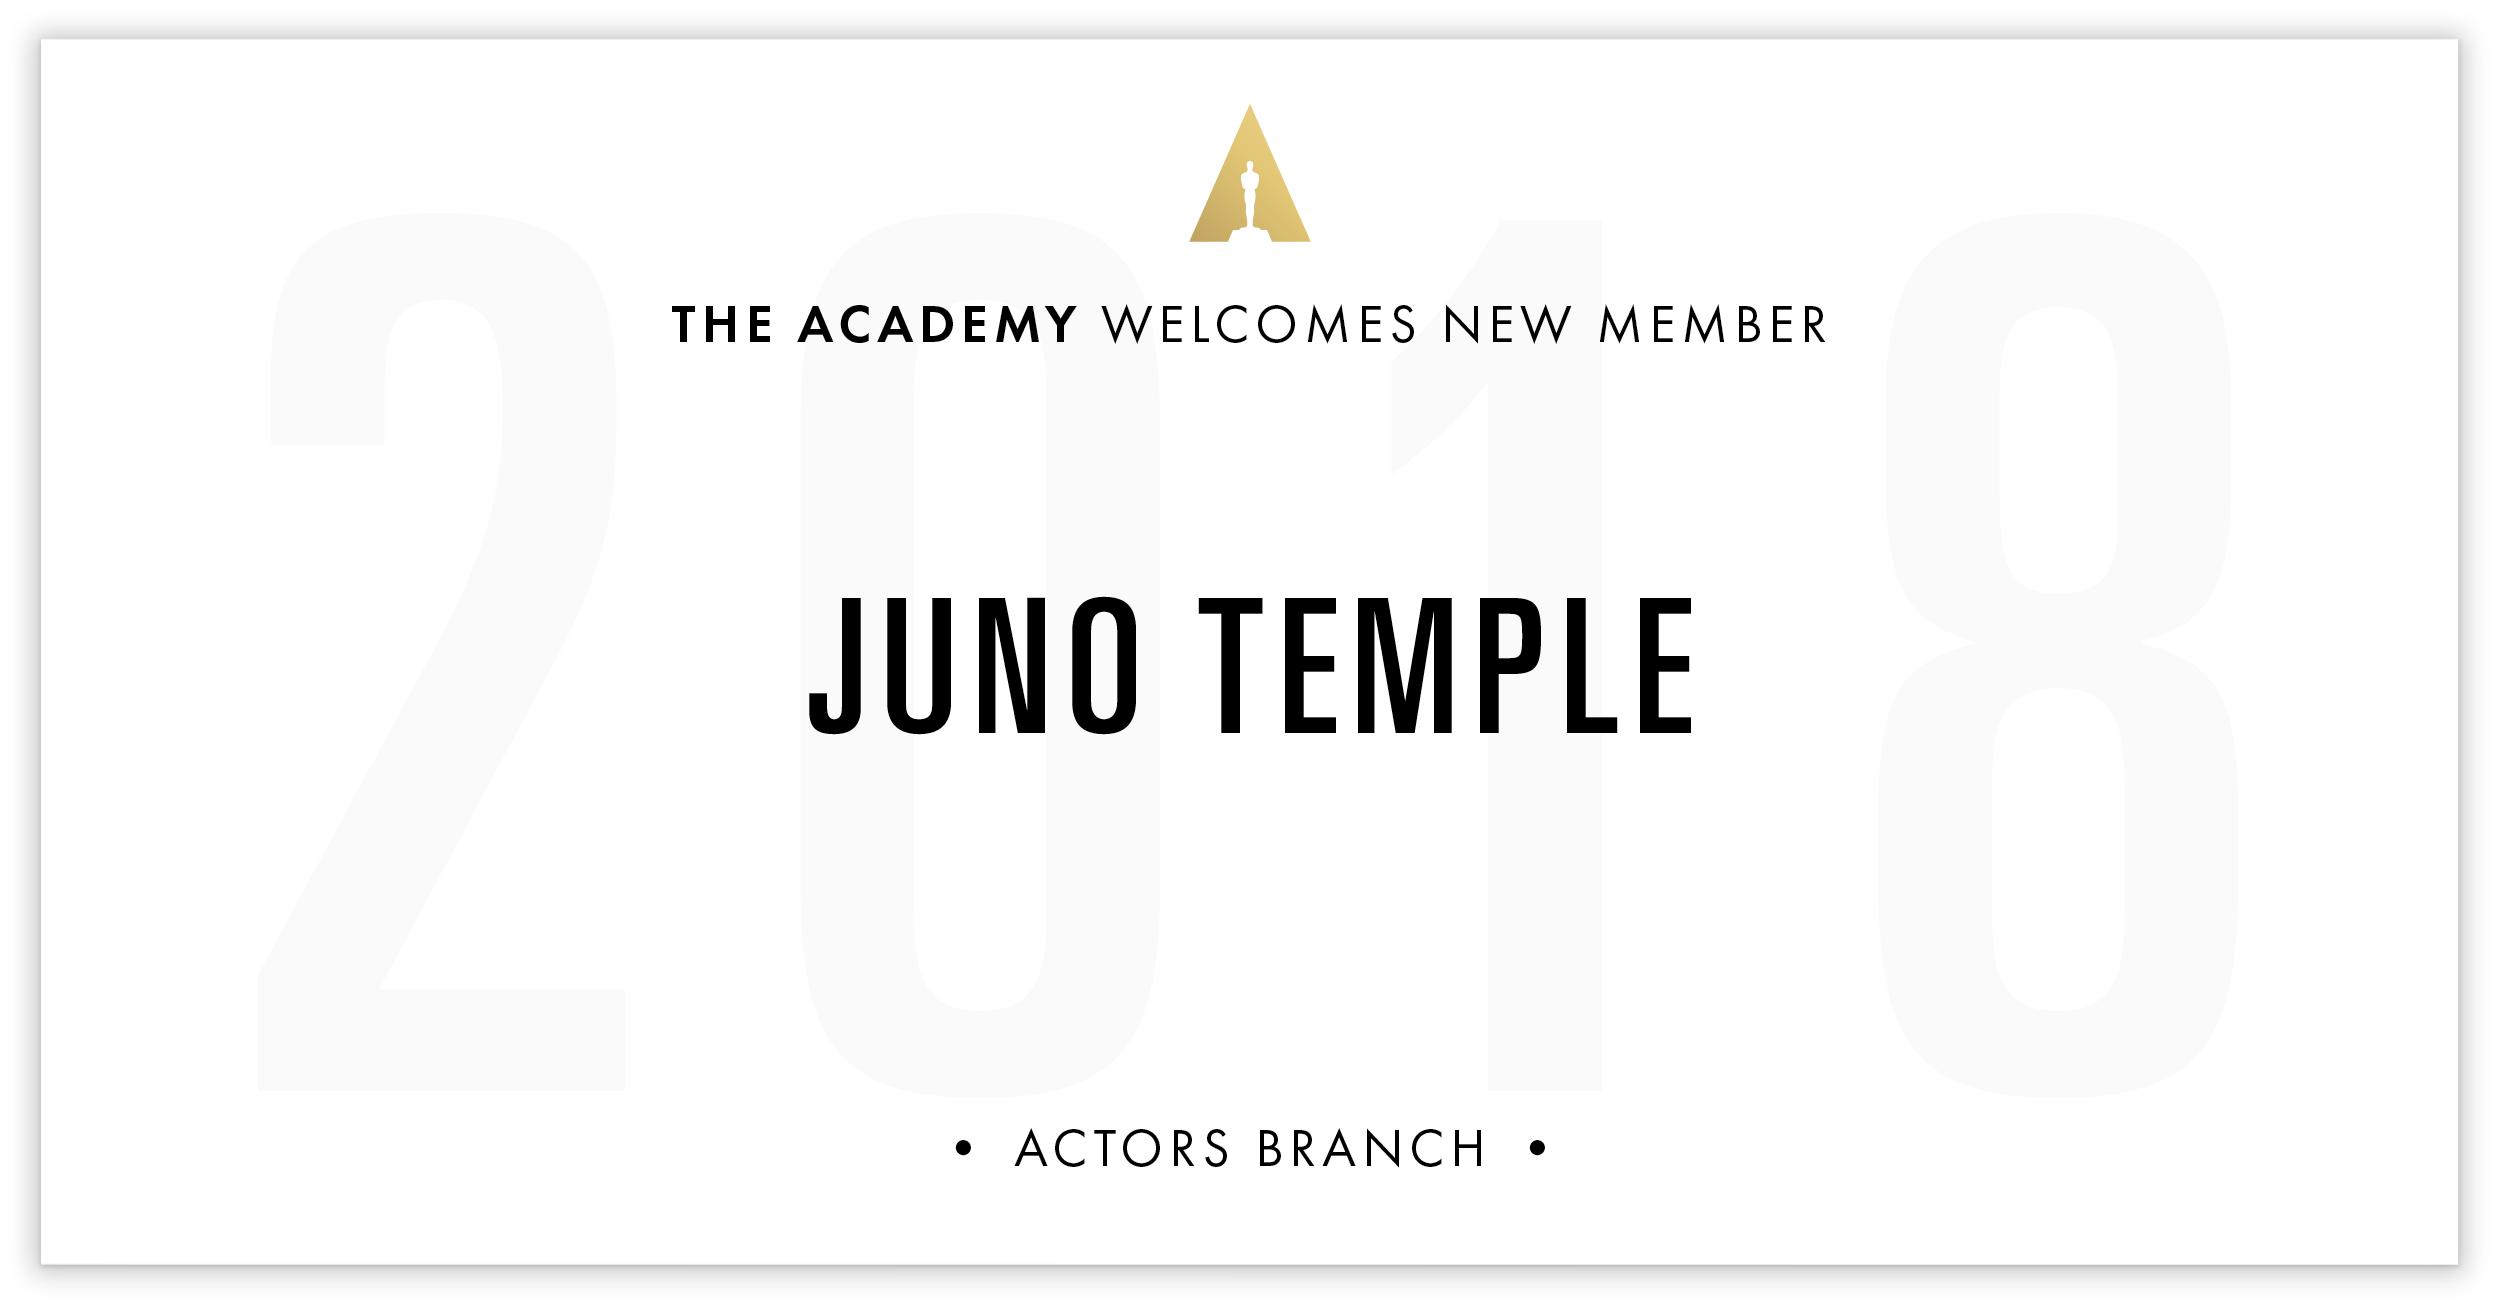 Juno Temple is invited!